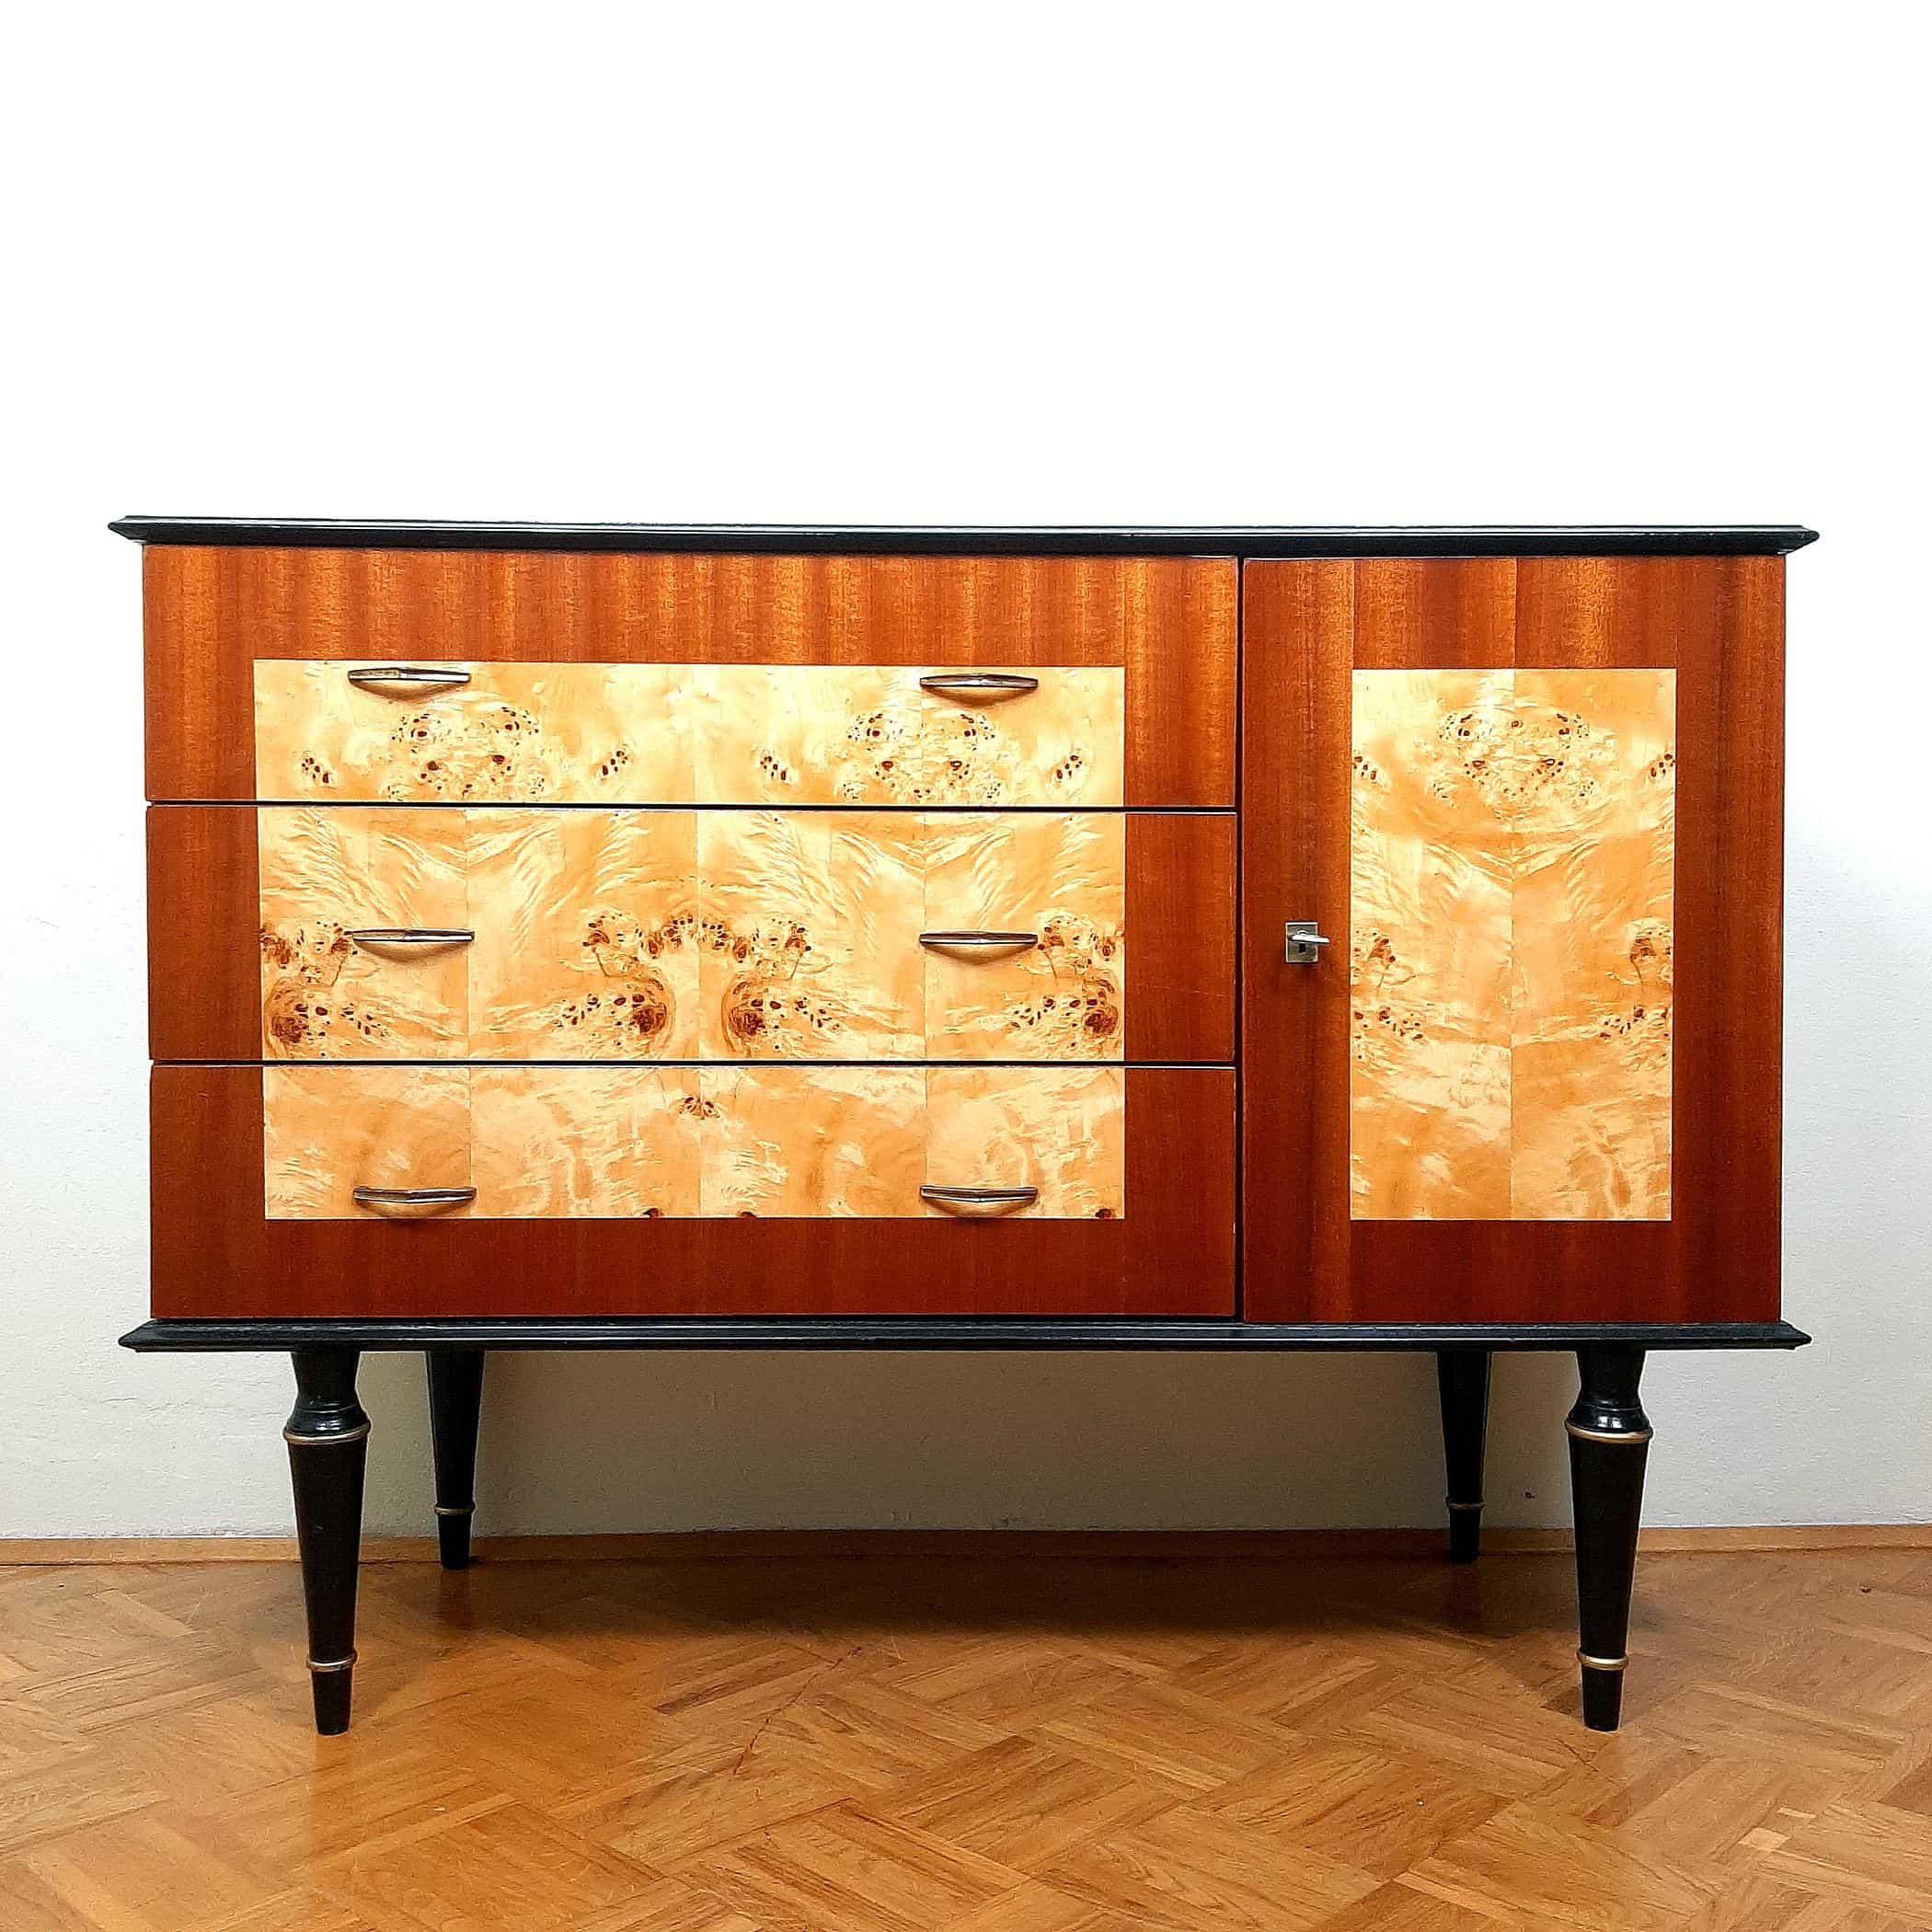 Mid-century Wood Sideboard 1970s Yugoslavia Polished Furniture Mahogany Birdseye Maple Console Table Retro Modern